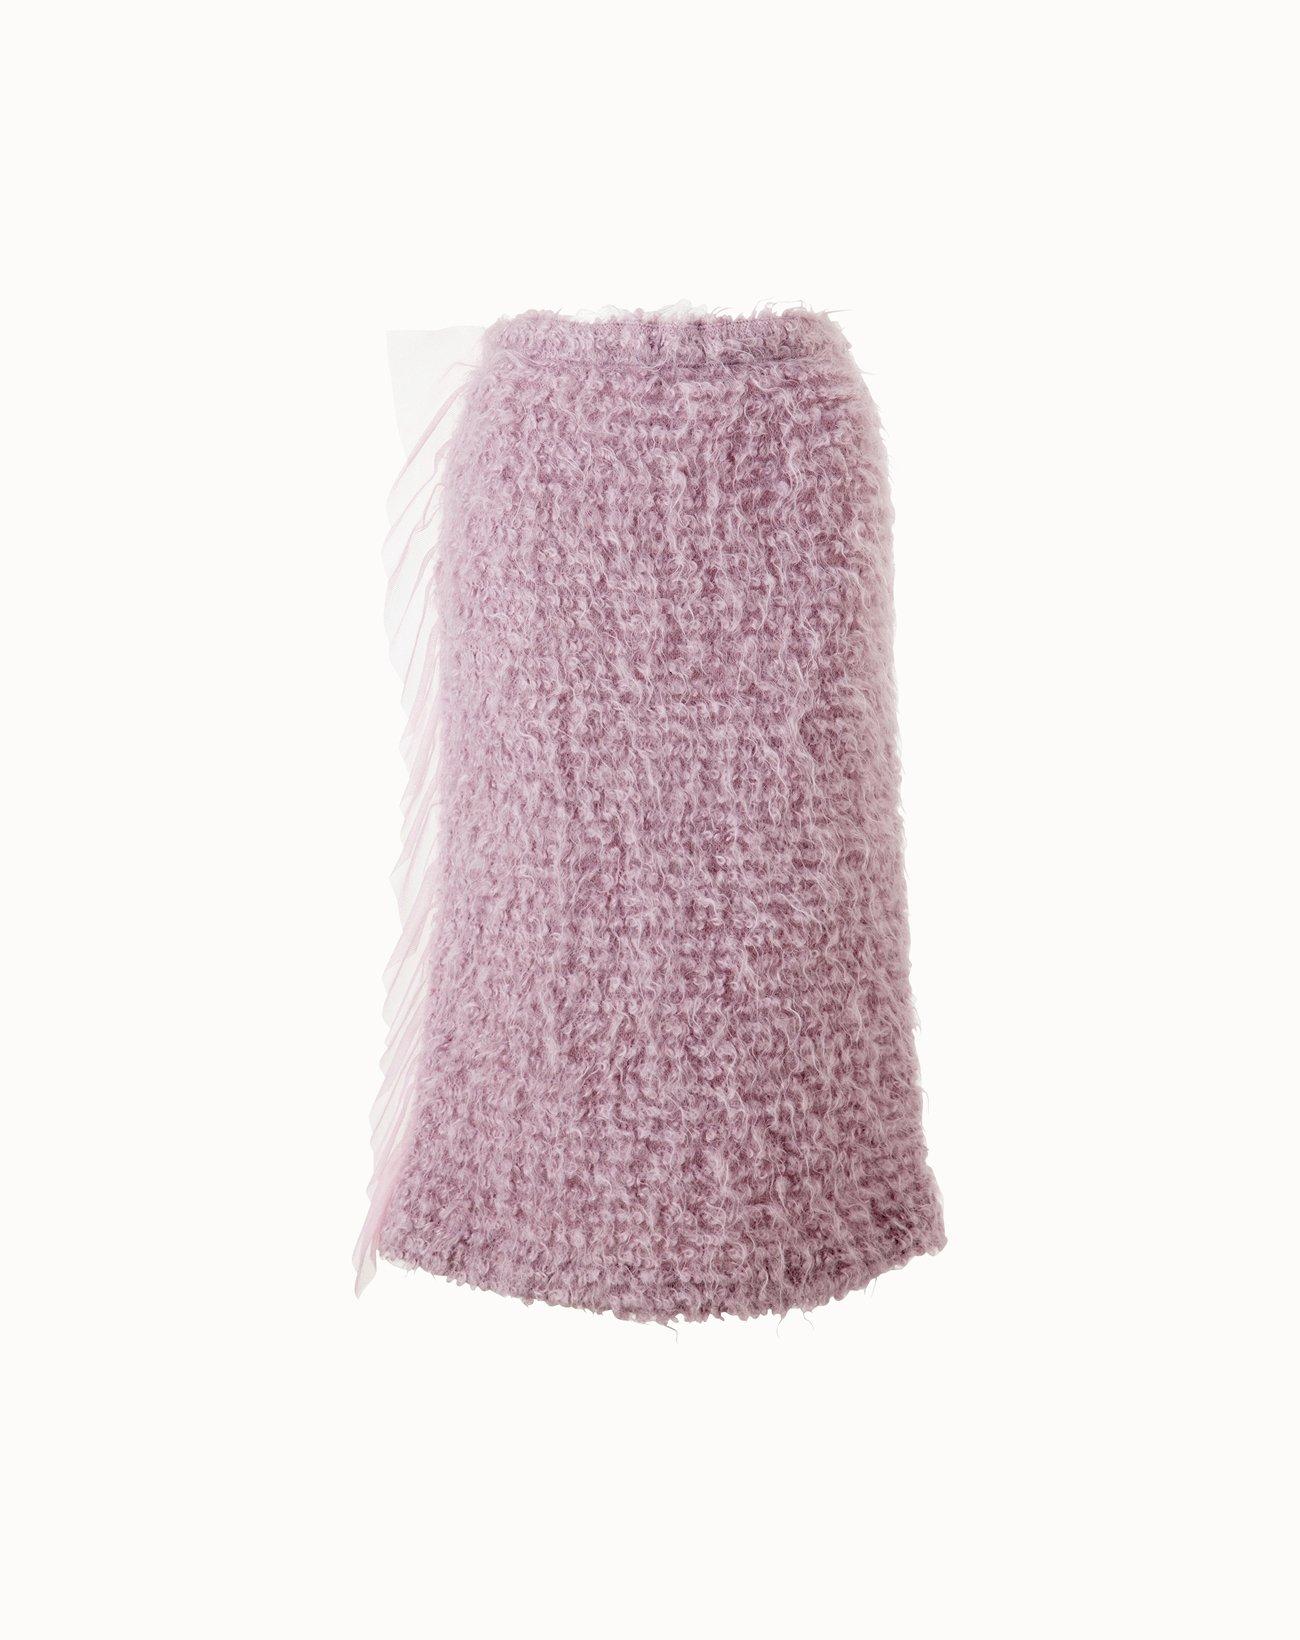 Knitting Shaggy Skirt  - Pink